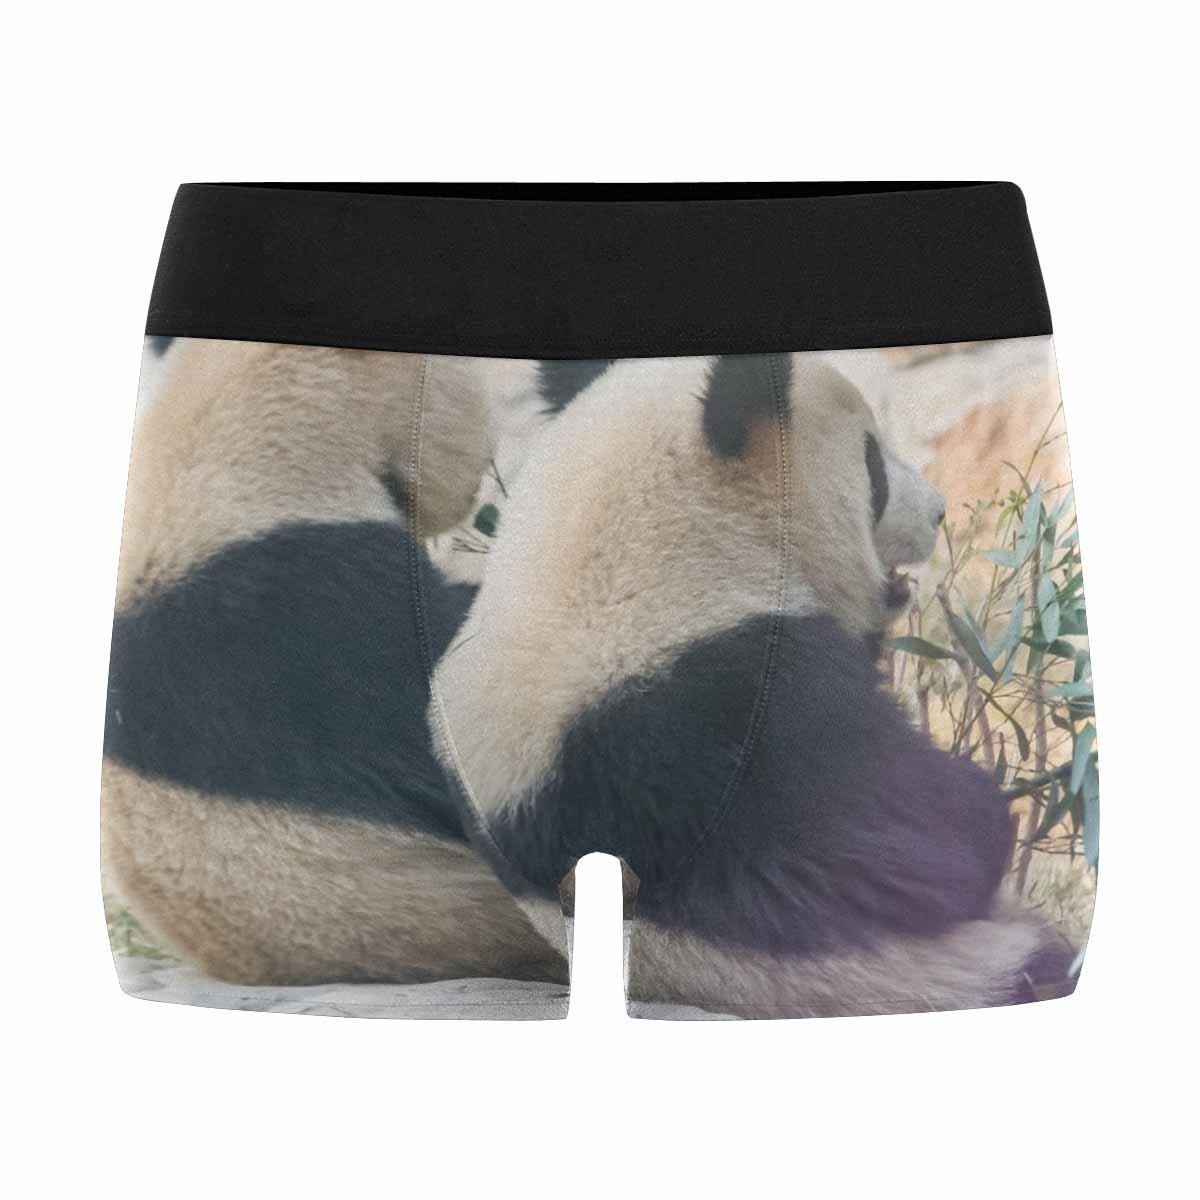 XS-3XL China INTERESTPRINT Boxer Briefs Mens Underwear Cub of Giant Panda Bear Playing in Zoo Beijing